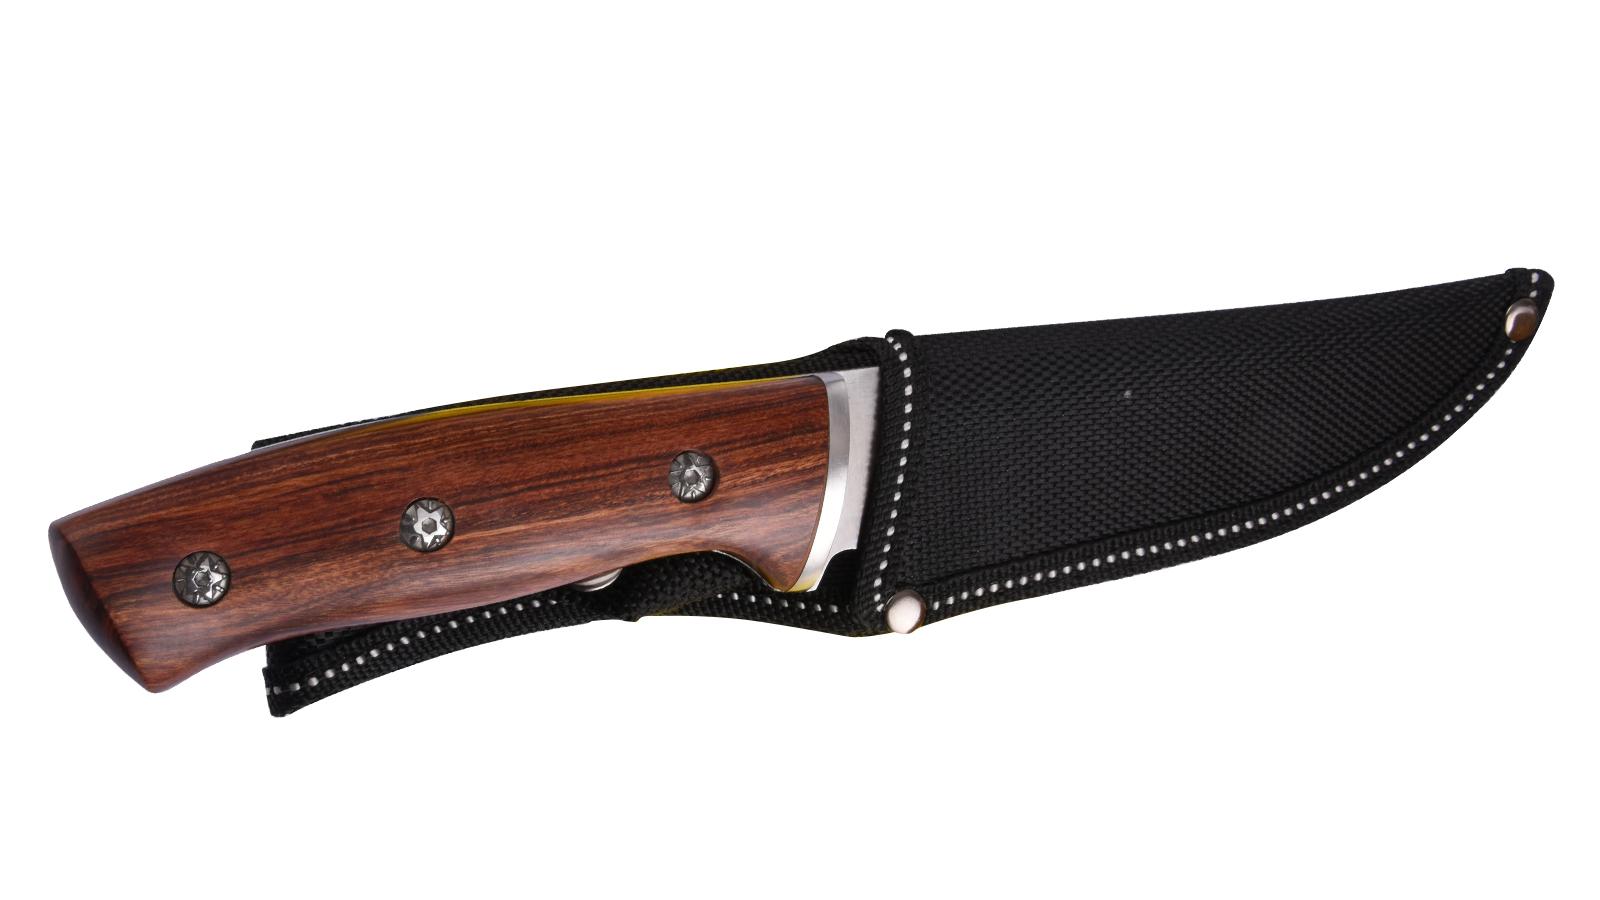 Охотничий нож Buck Knives в чехле